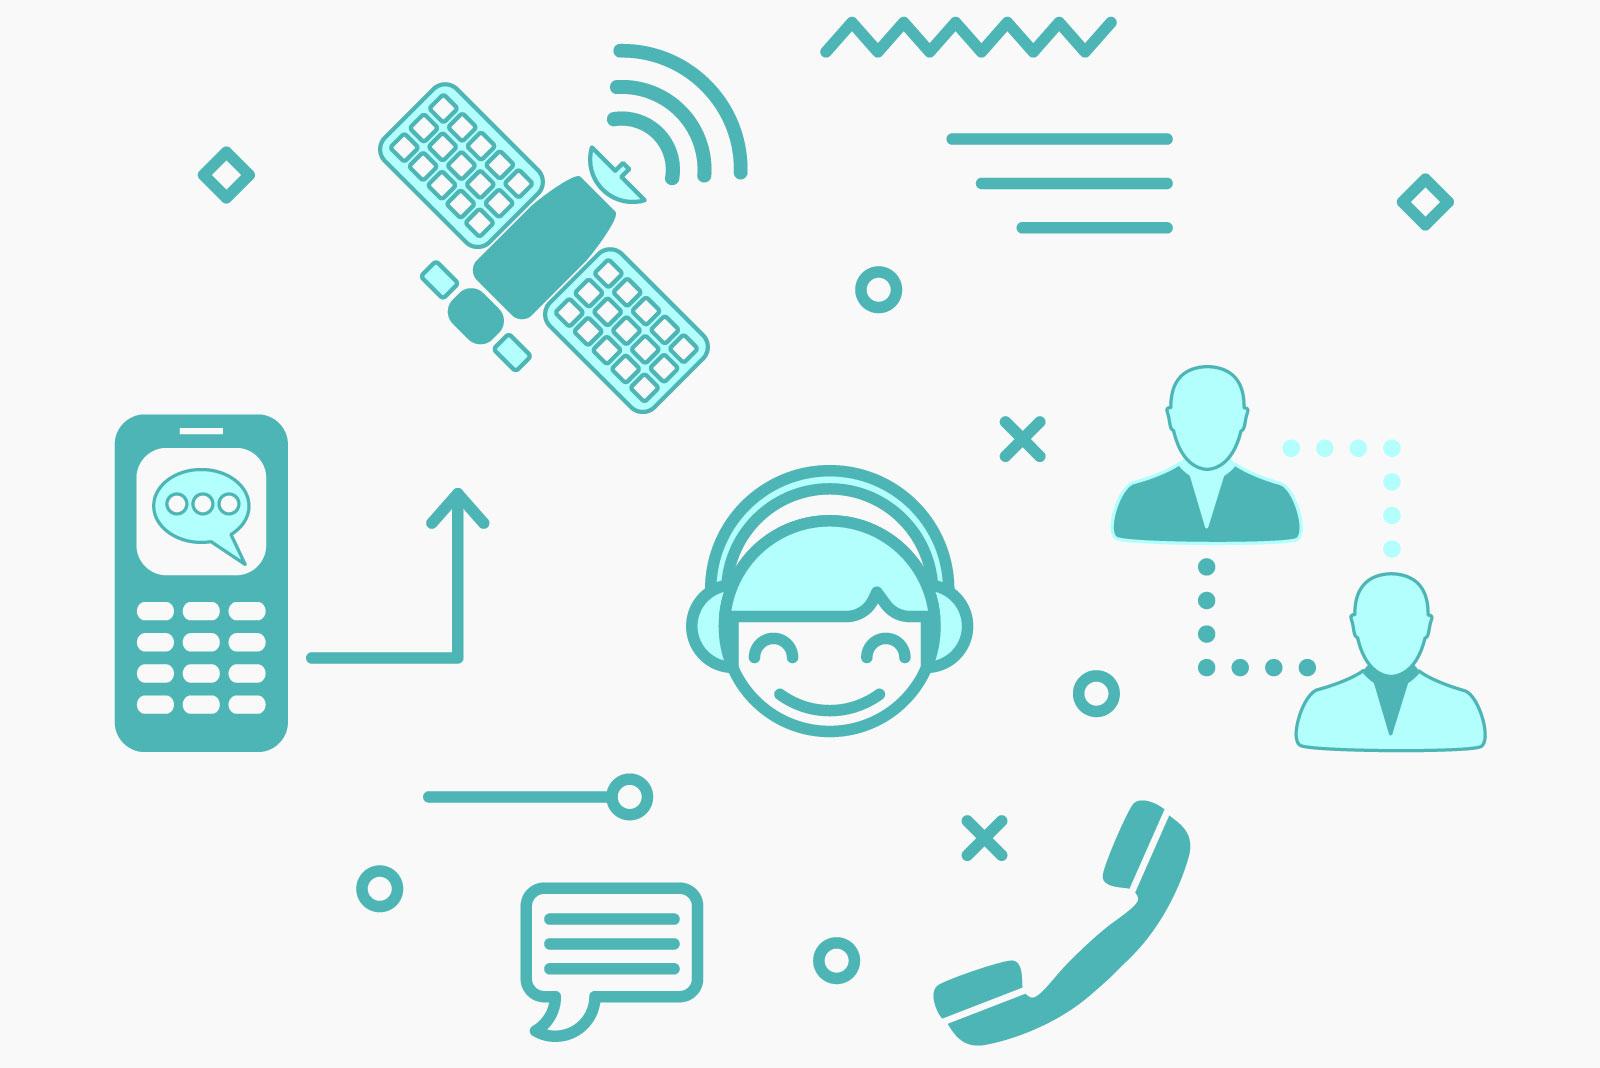 Bots for Telecommunications